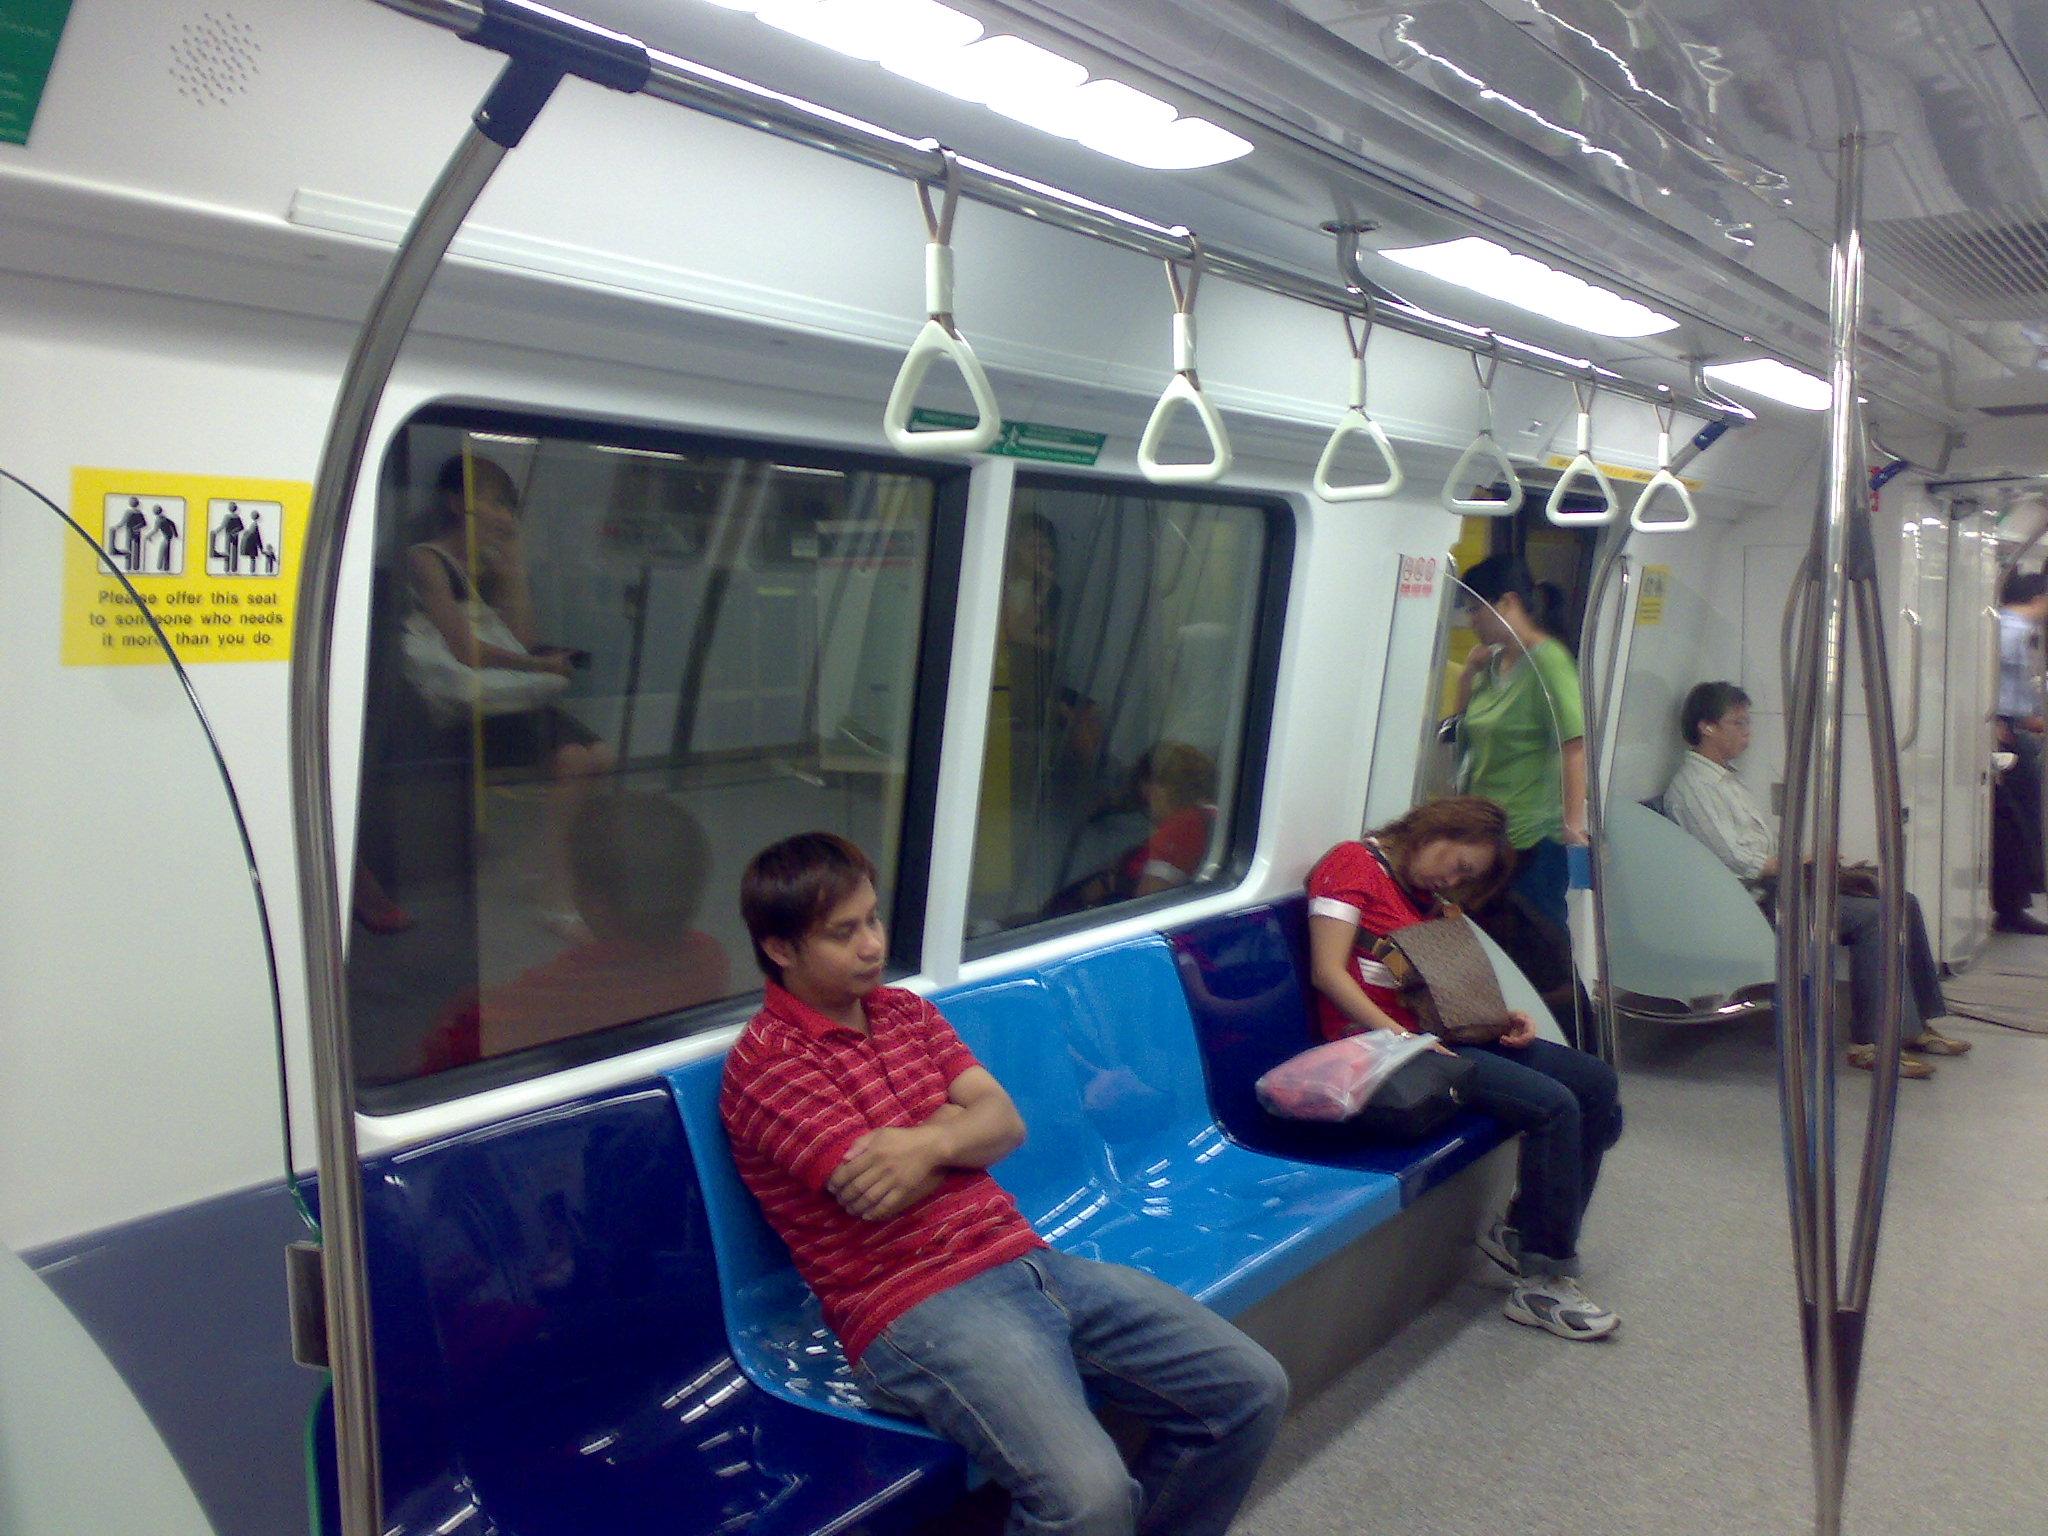 Train Seats Market in 360MarketUpdates.com